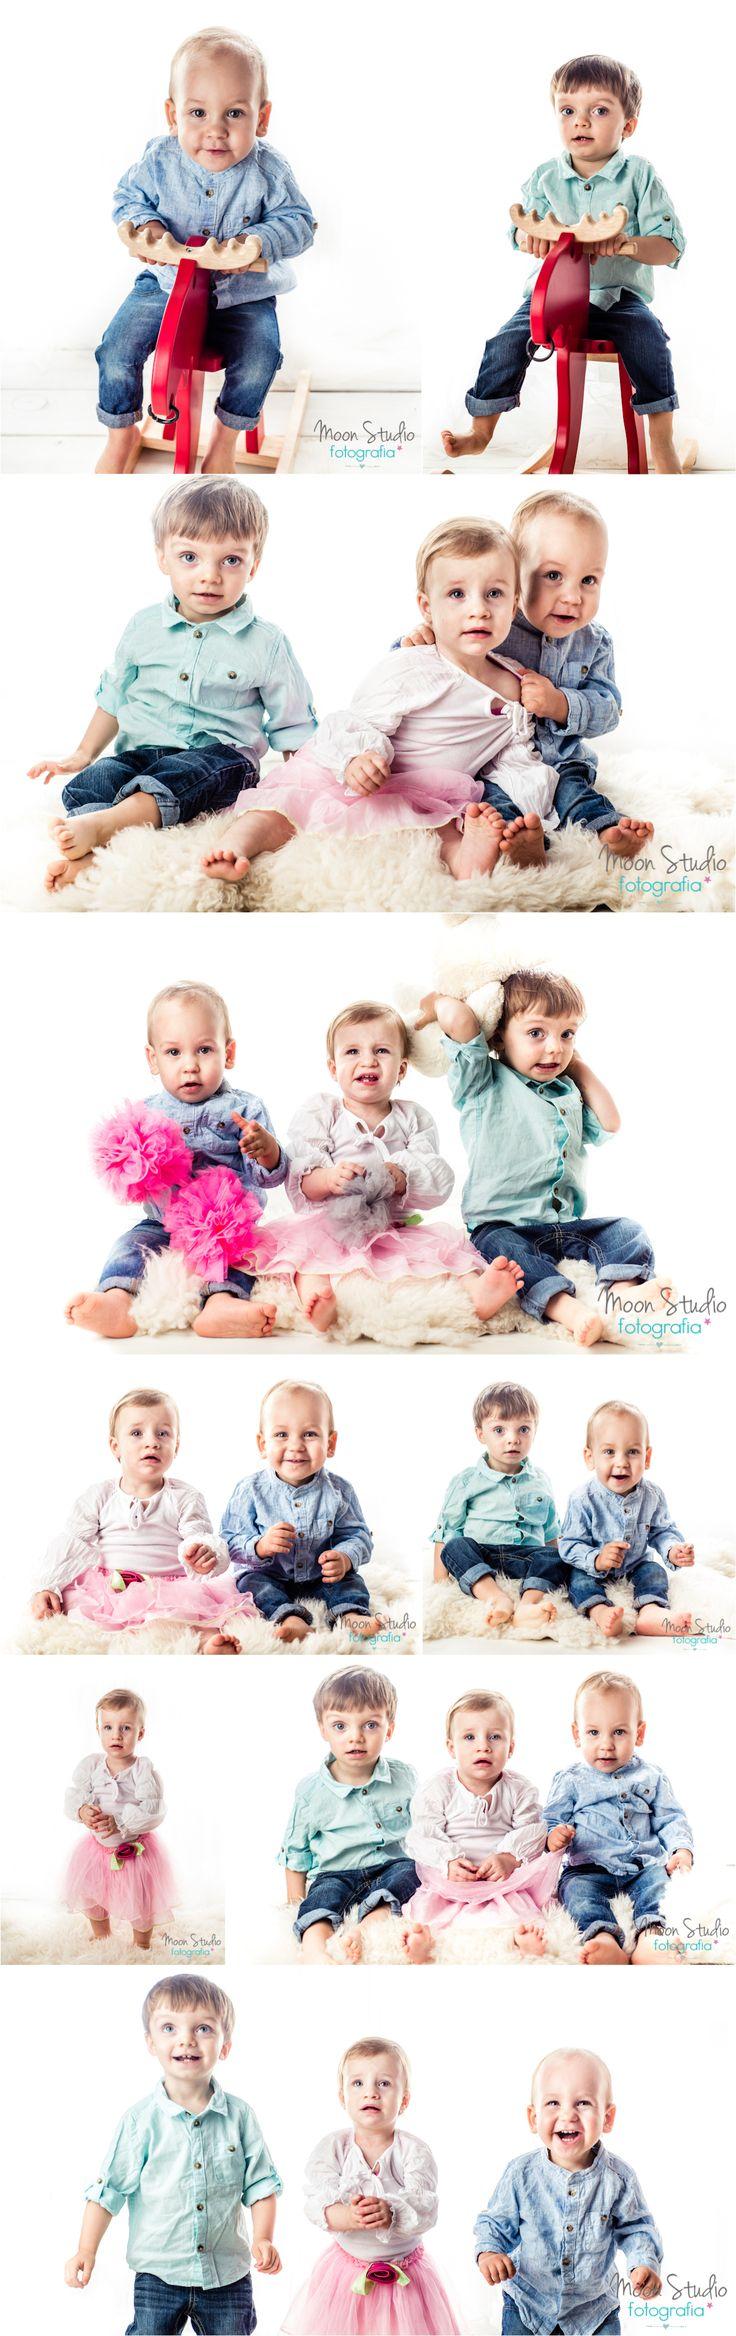 children photo session, baby, photoshoot, moon studio fotografia wągrowiec, high key photography